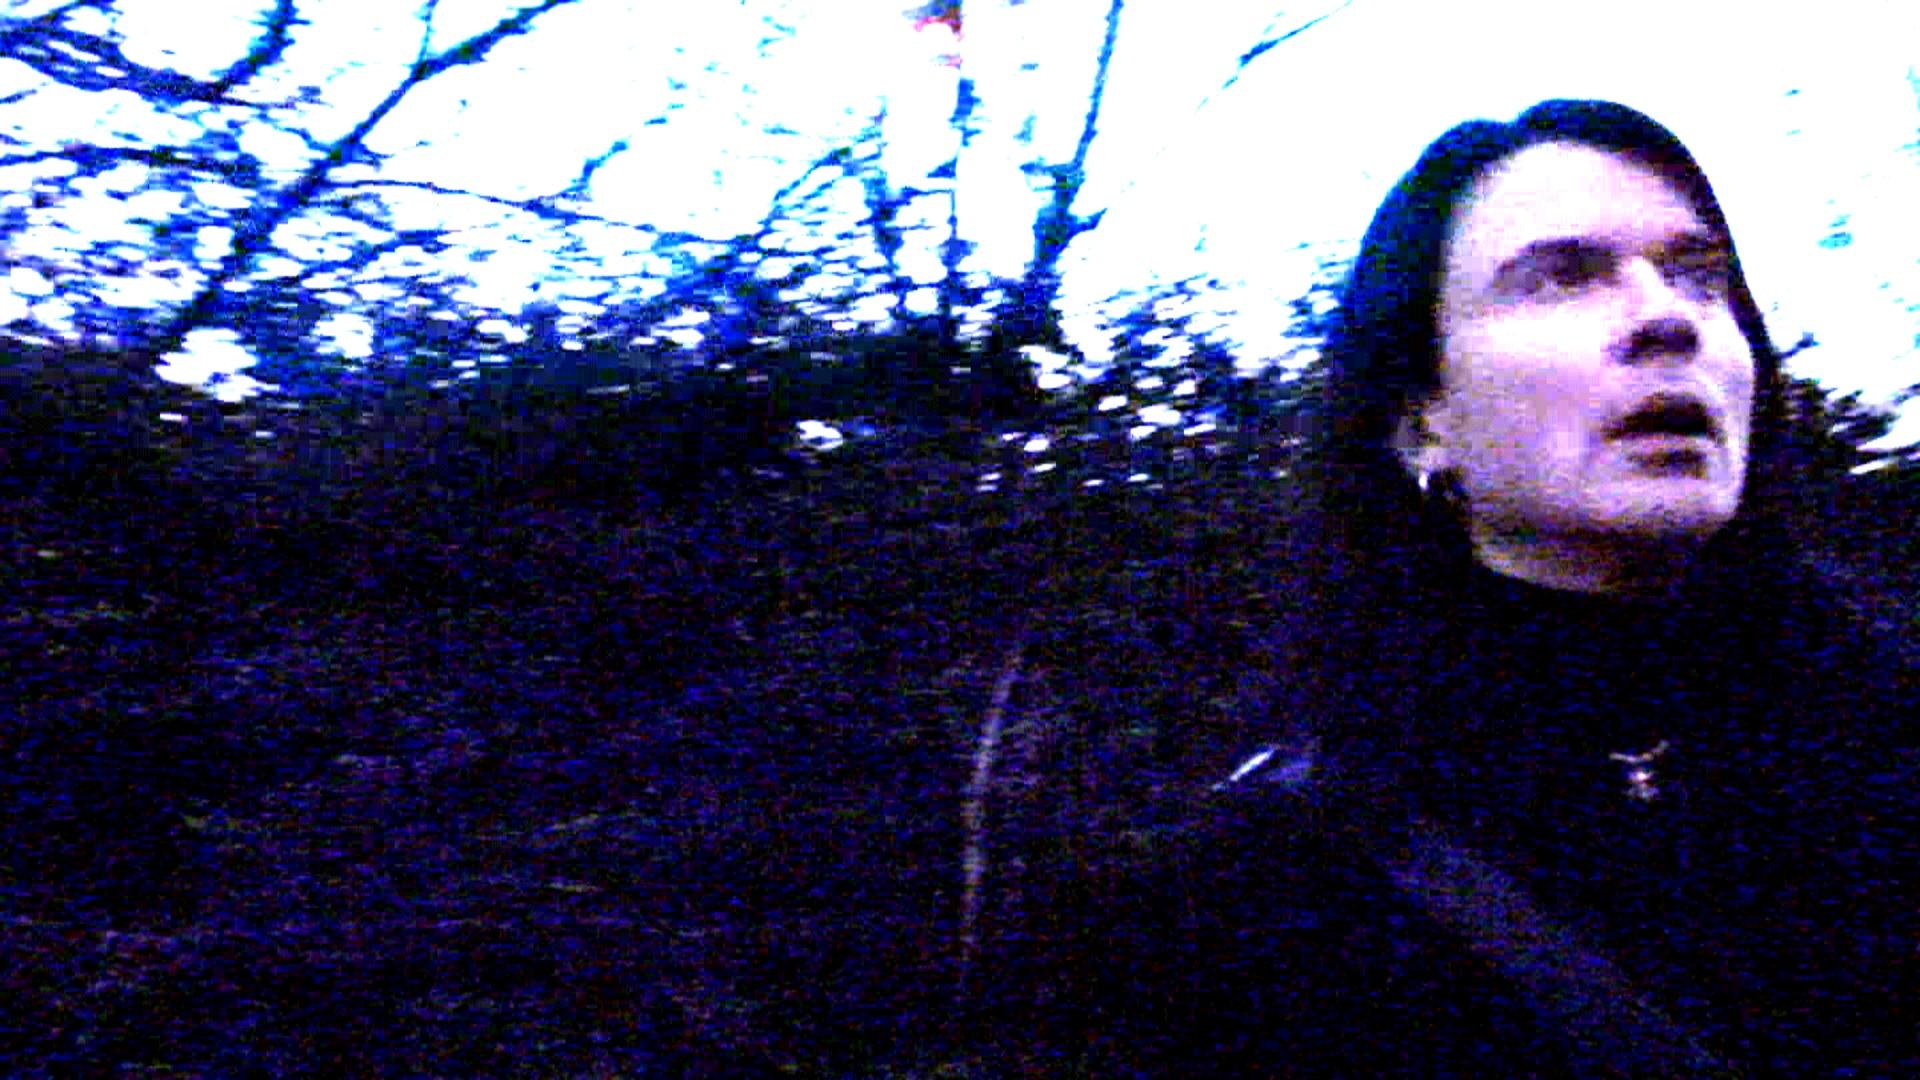 Rohan Quine, 'The Imagination Thief' - film 'MARC 5', still 15